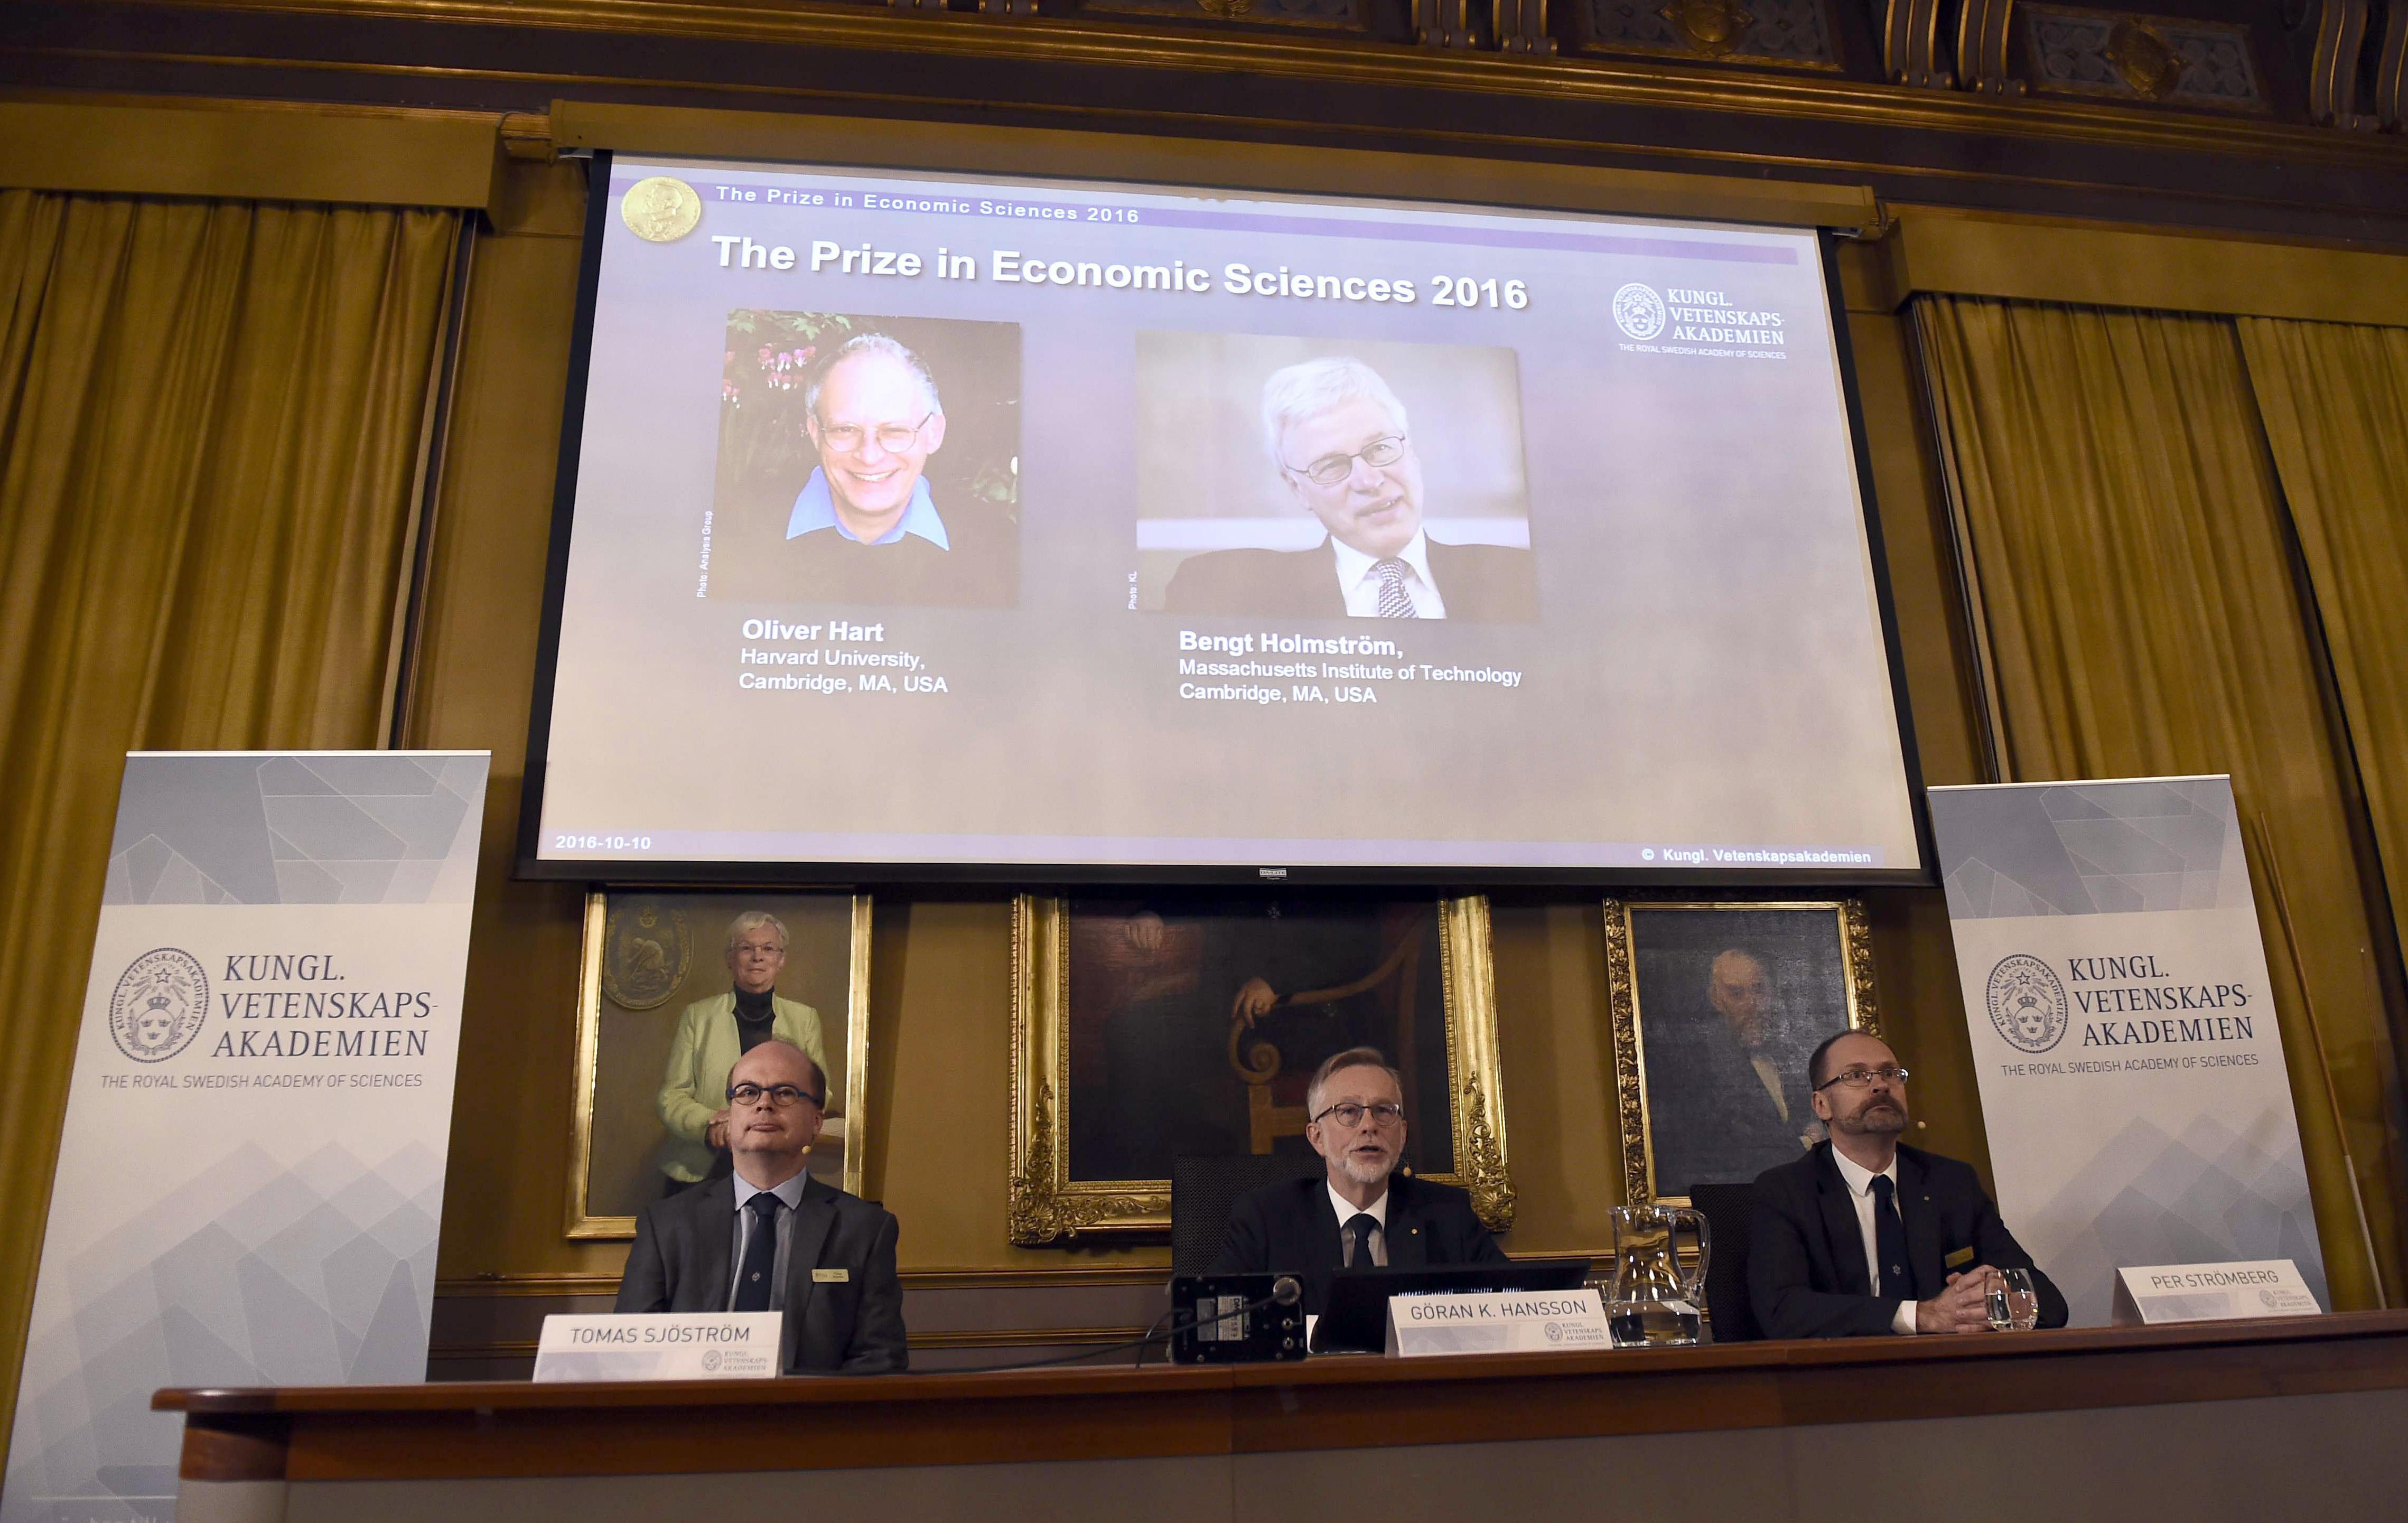 Двама вземат Нобелова награда за принос в договорната теория